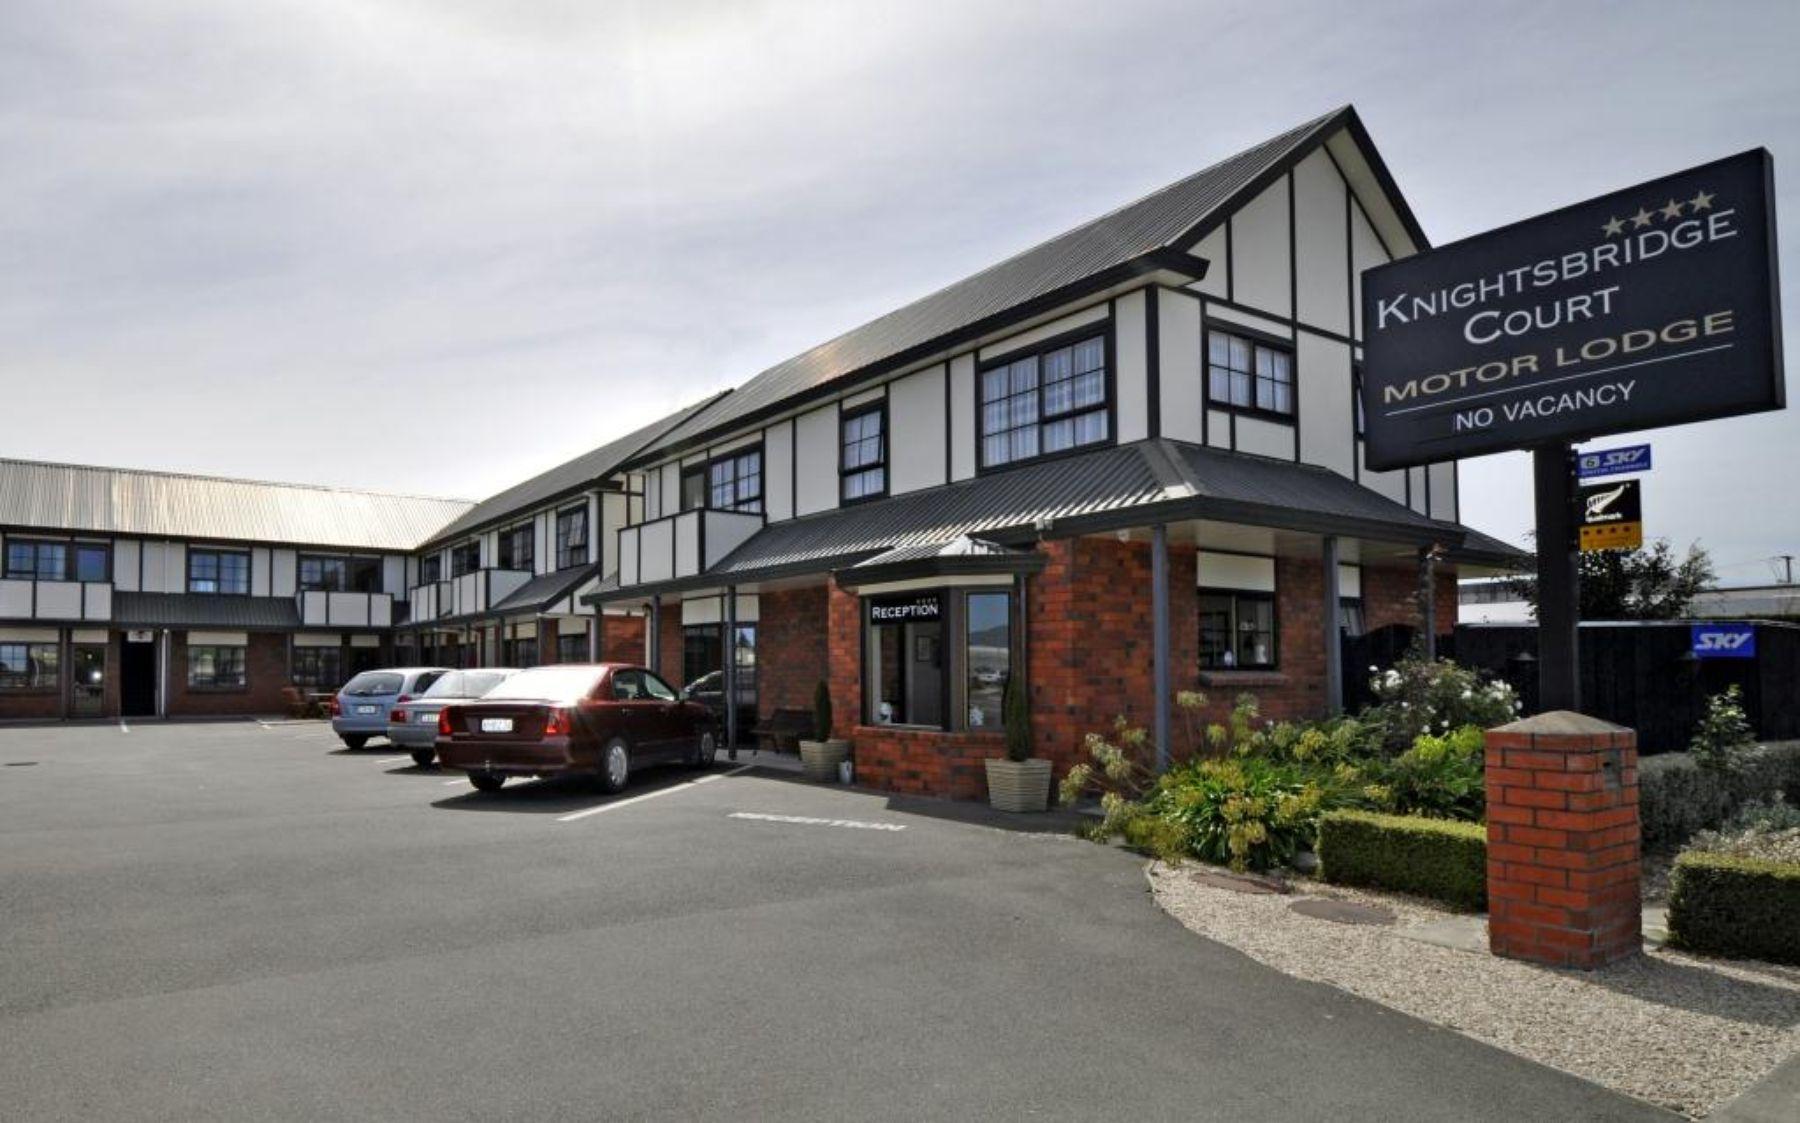 Knightsbridge Court Motor Lodge